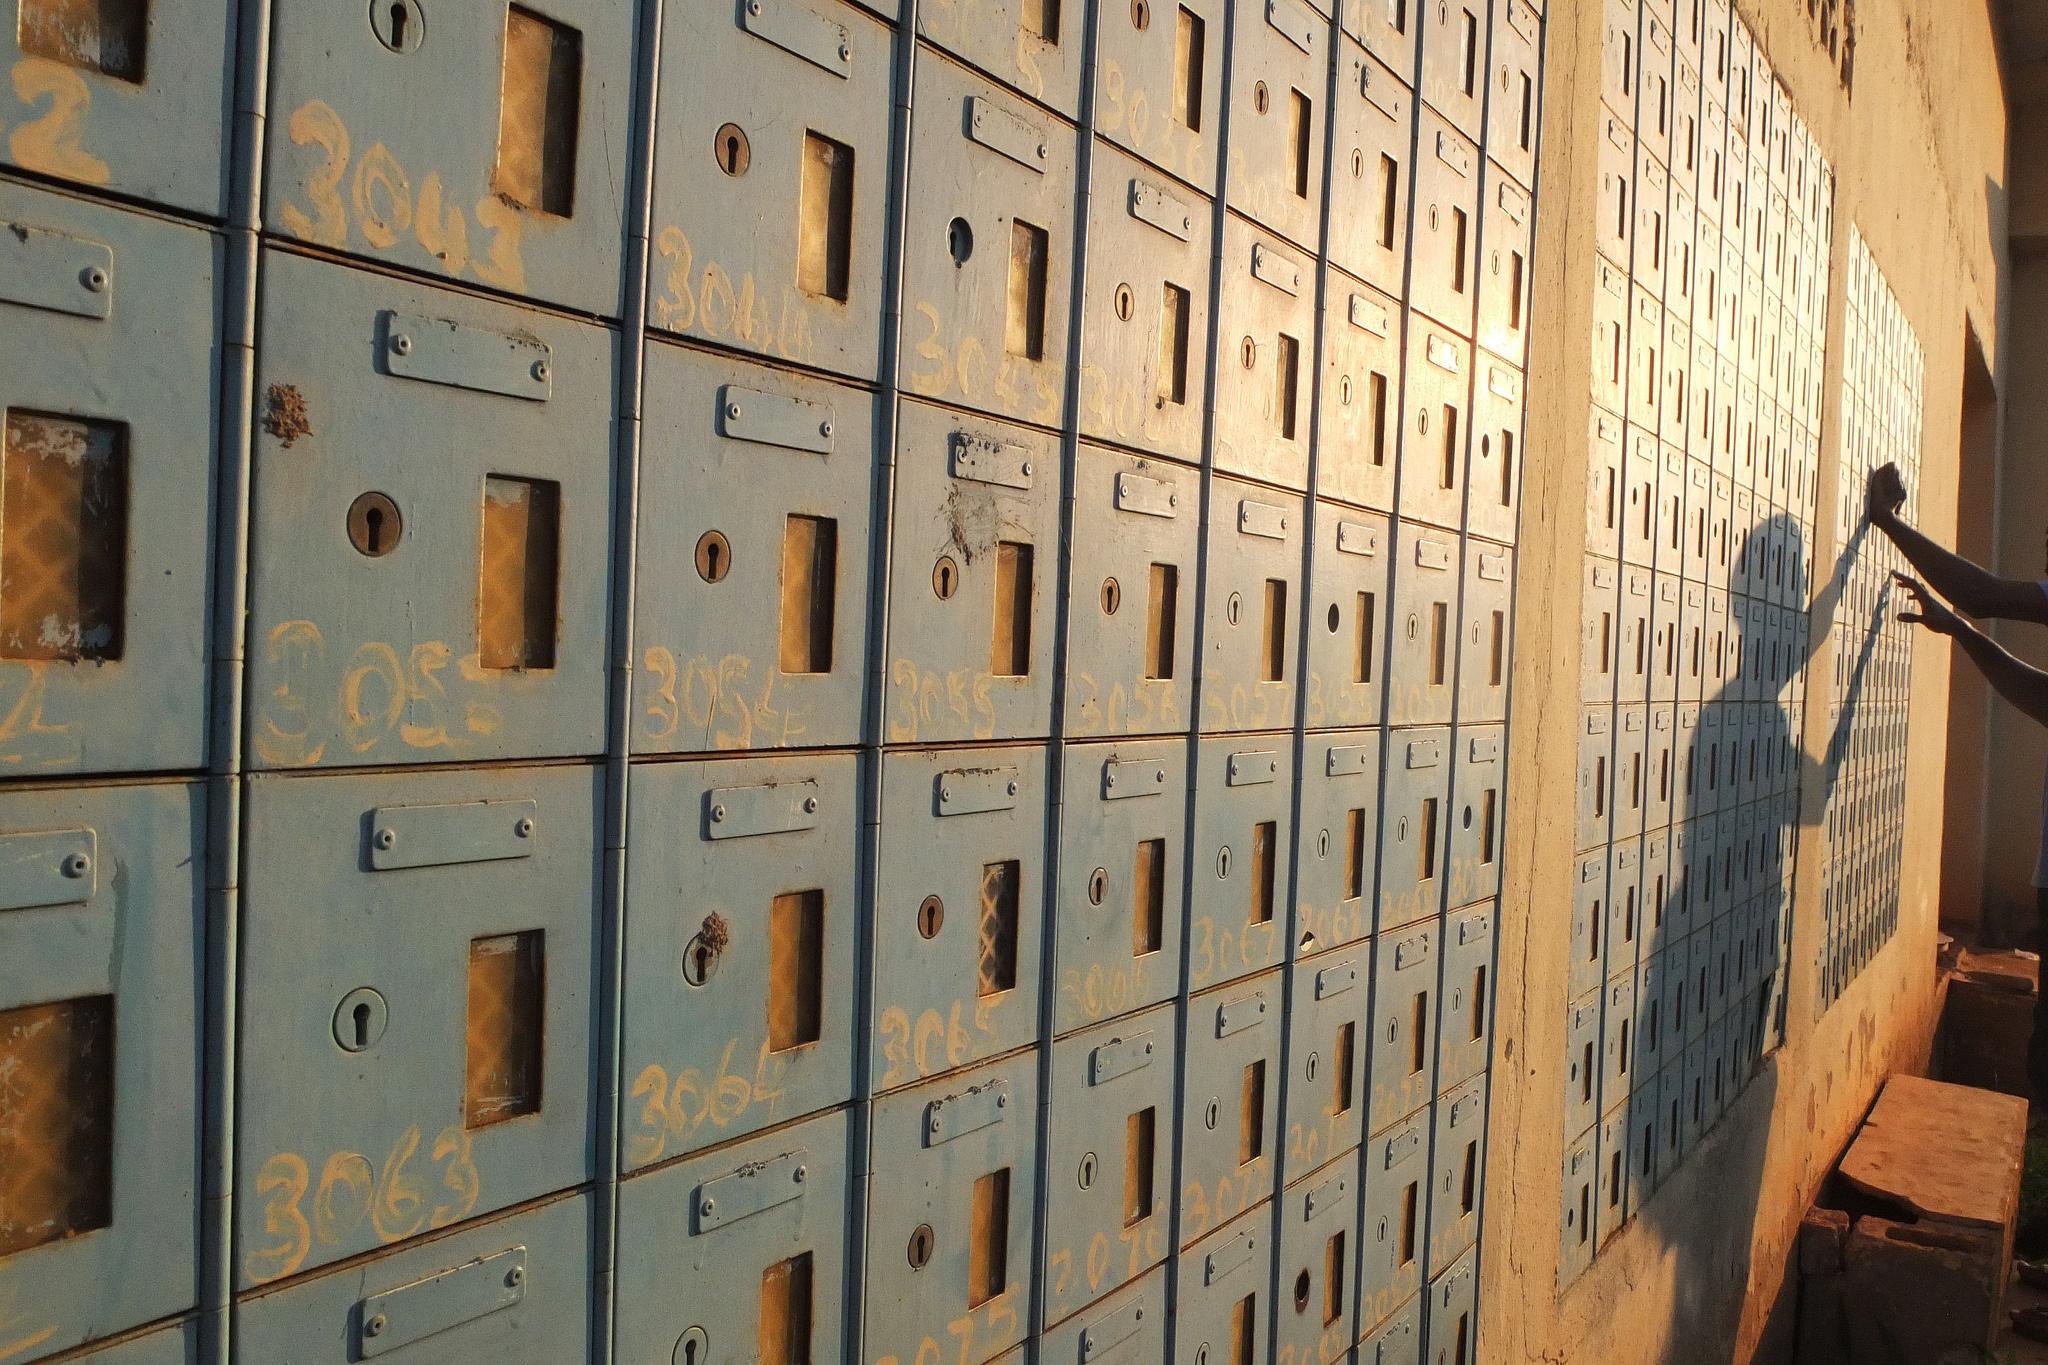 Post office in Nigeria